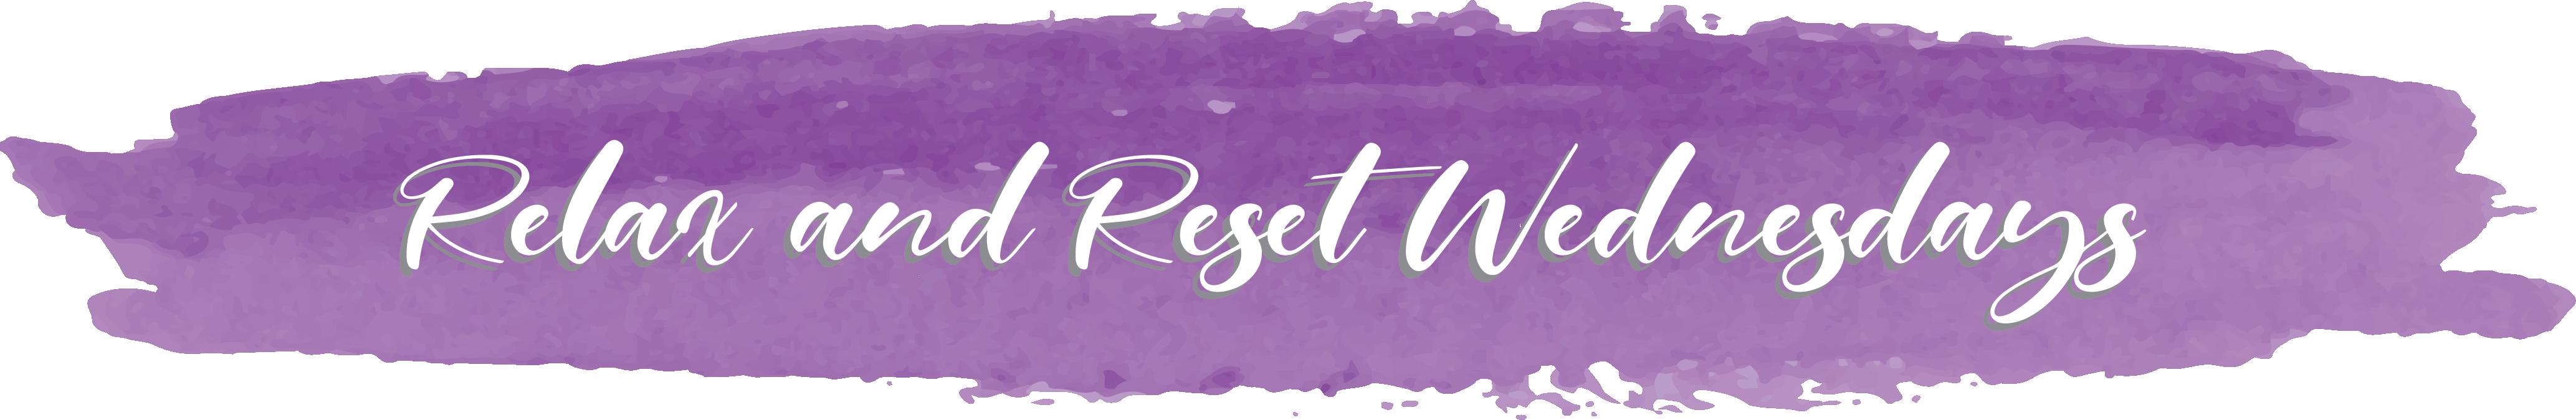 Relax and Reset Wednesdays web header 2019